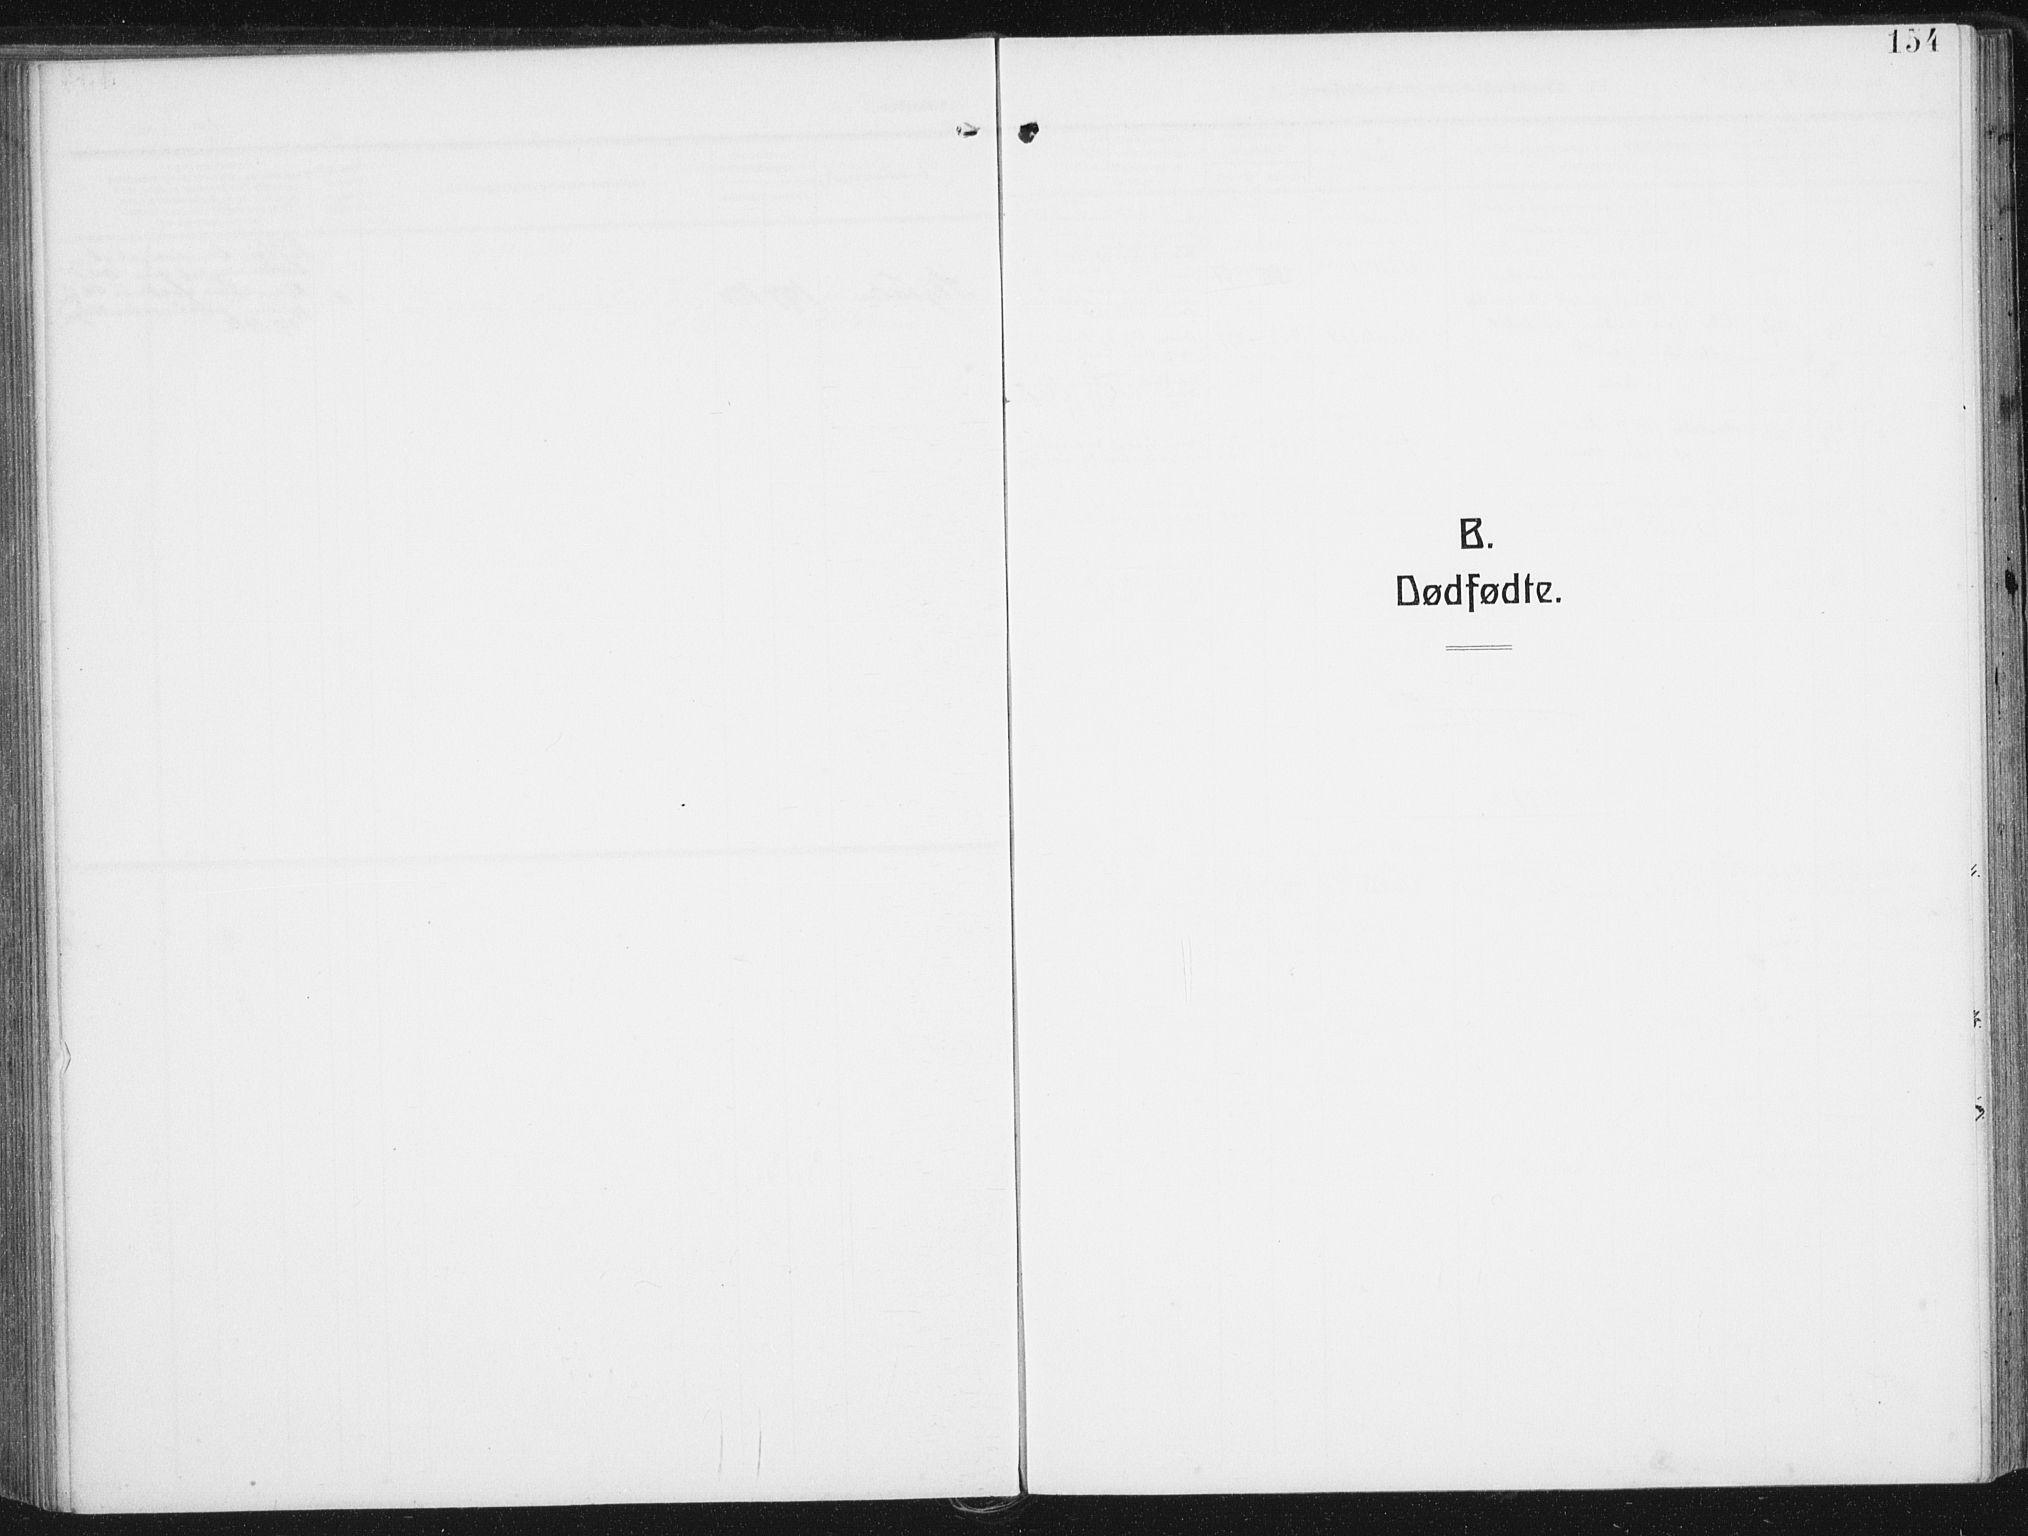 SAT, Ministerialprotokoller, klokkerbøker og fødselsregistre - Nordland, 880/L1135: Ministerialbok nr. 880A09, 1908-1919, s. 154